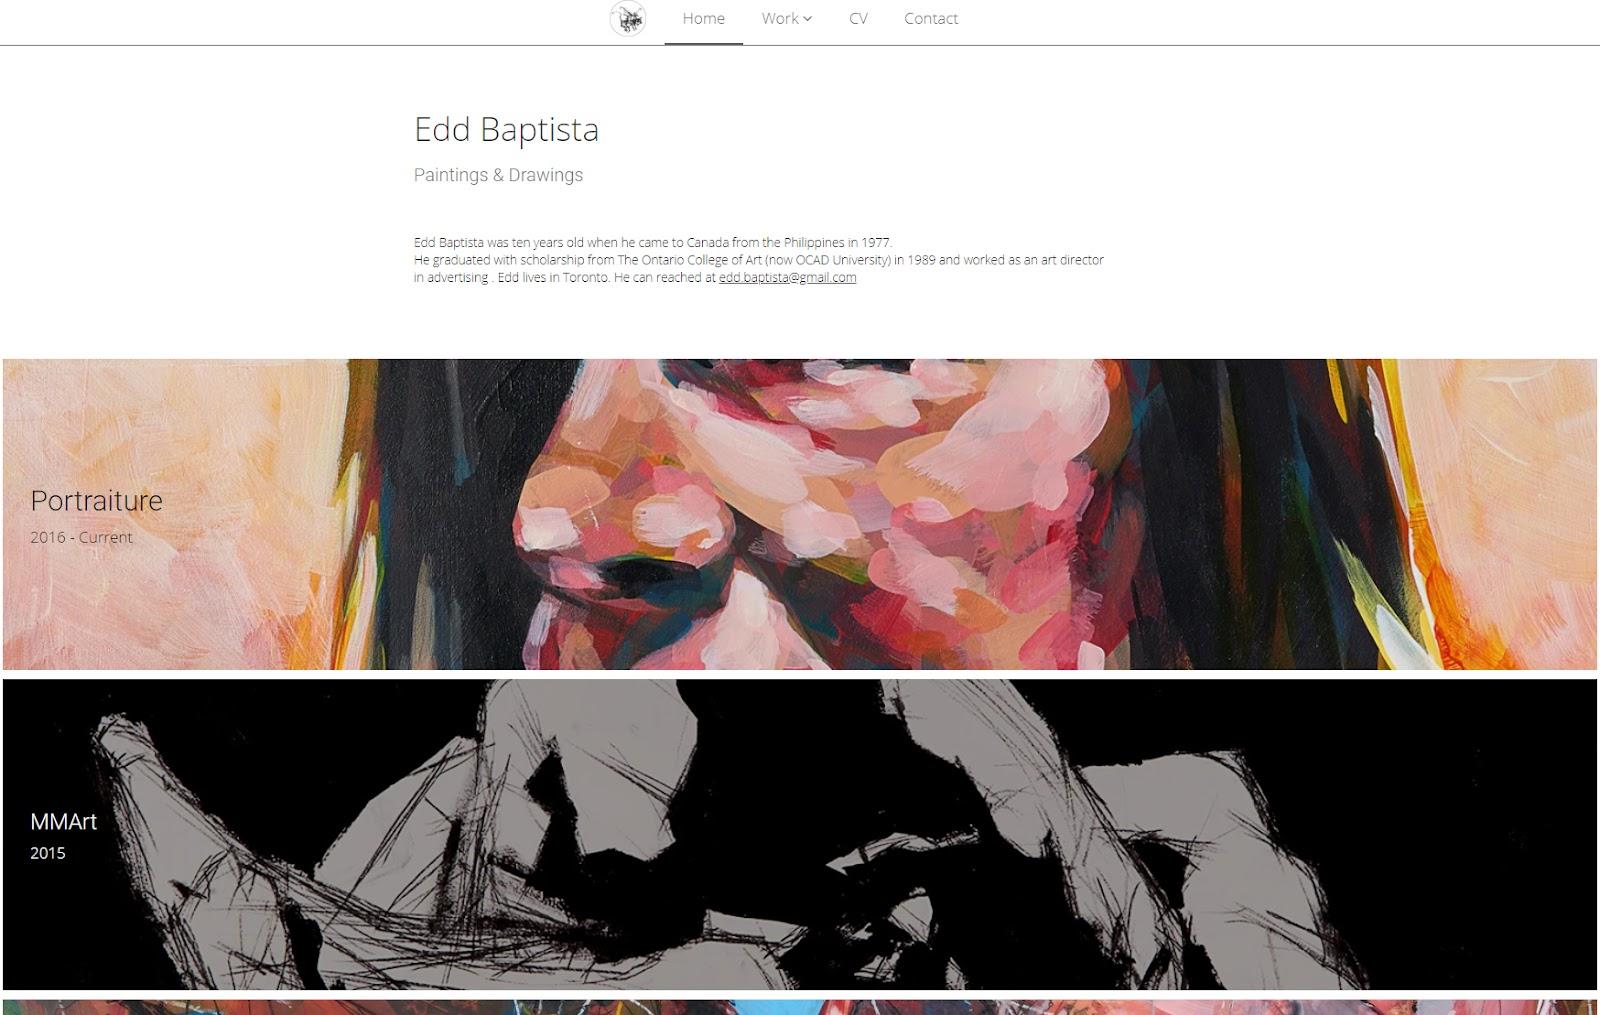 Edd Baptista homepage